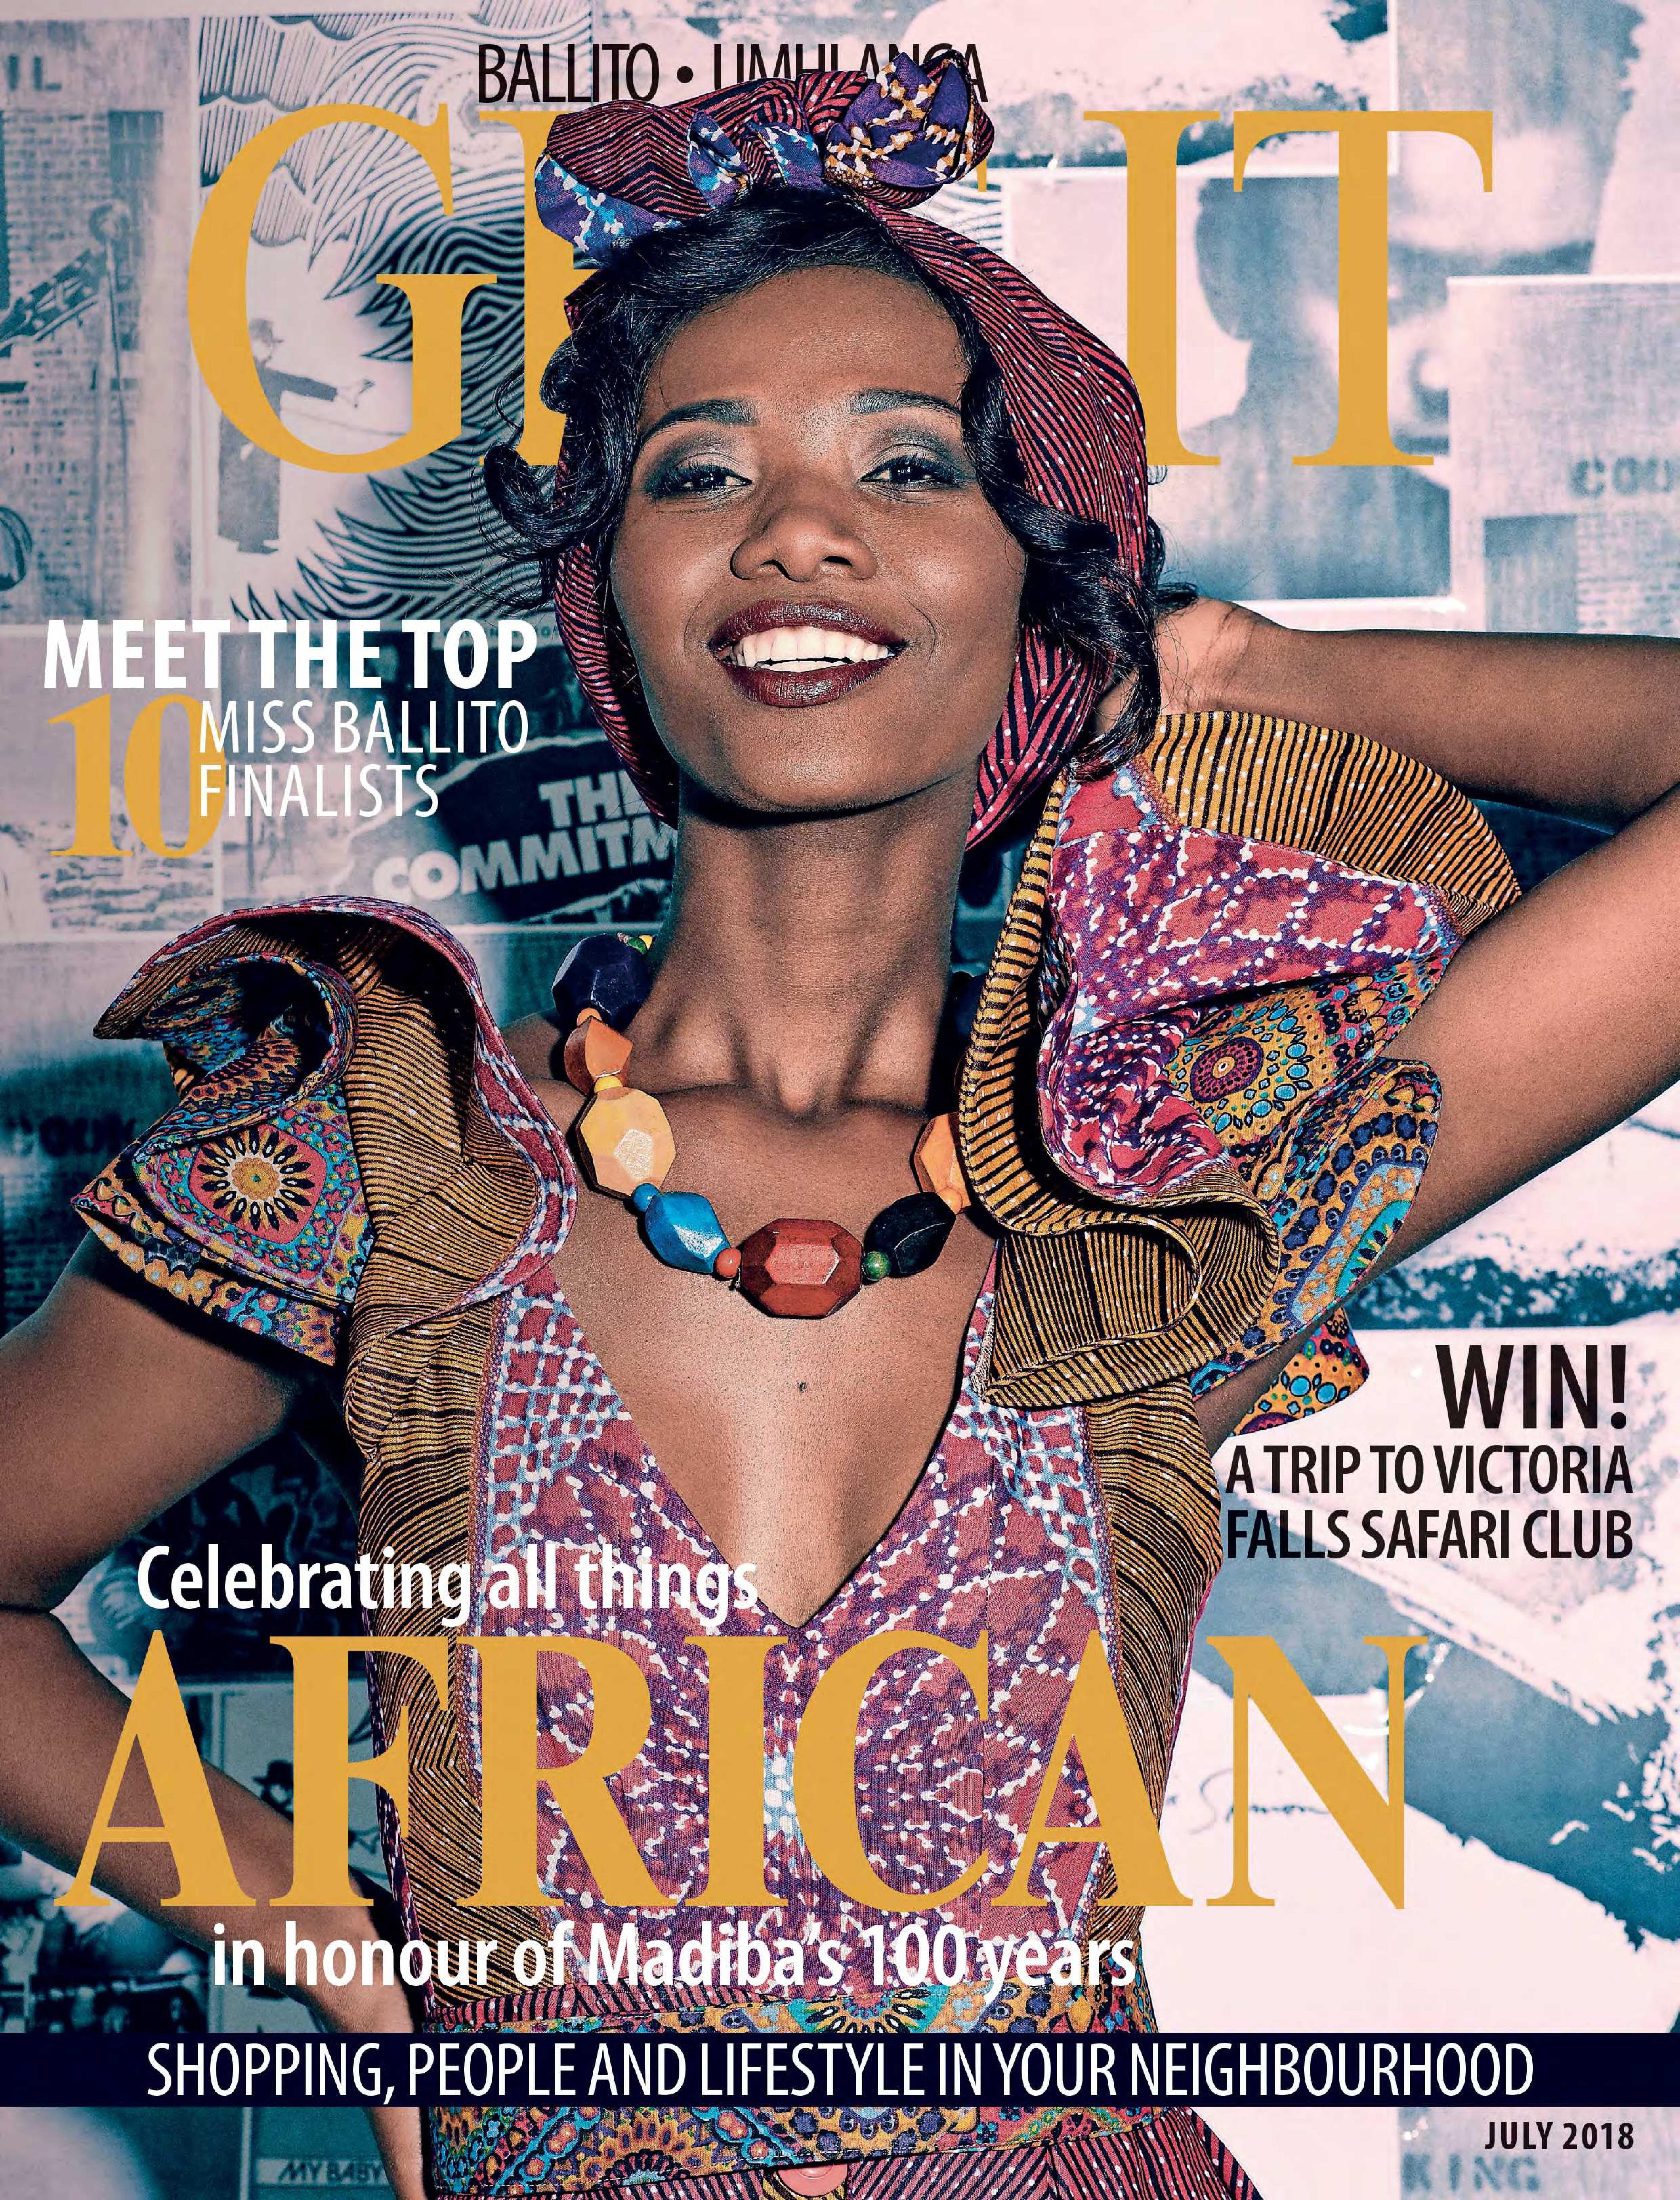 get-magazine-ballitoumhlanga-july-2018-epapers-page-1